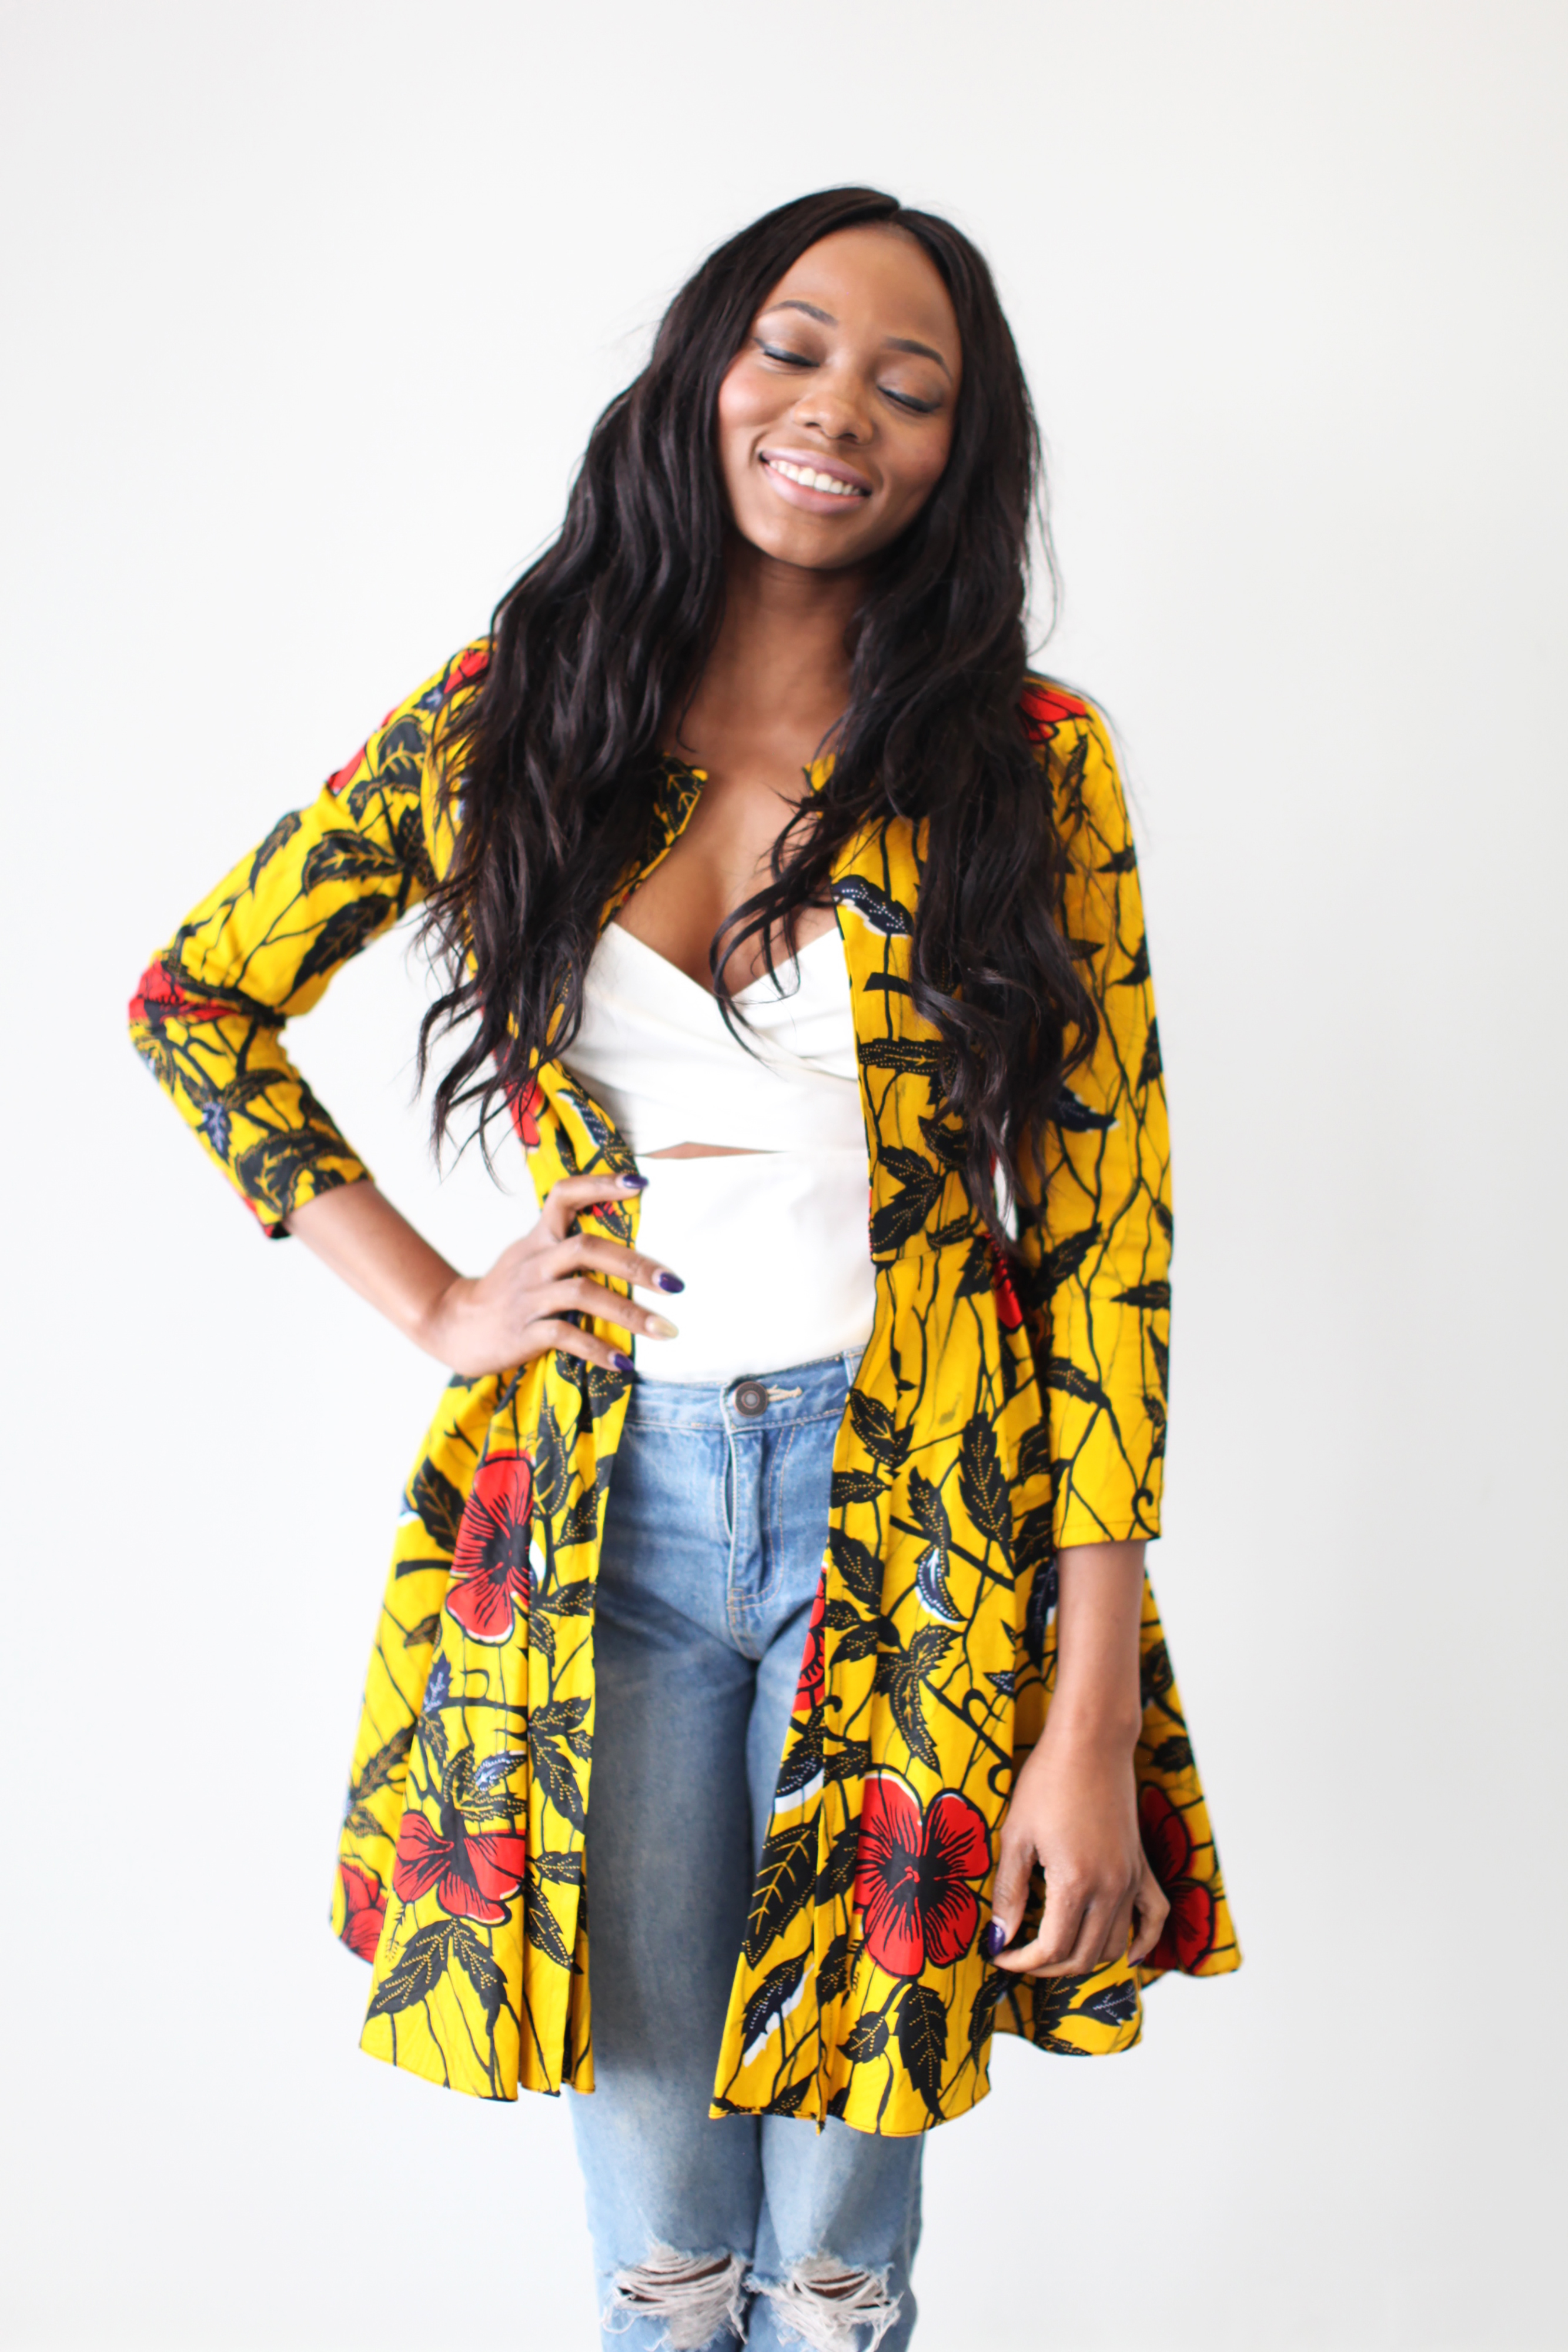 ankara-product-of-the-day-omi-woodss-the-nairobi-ankara-jacket-dress-in-golden-hibiscus-3